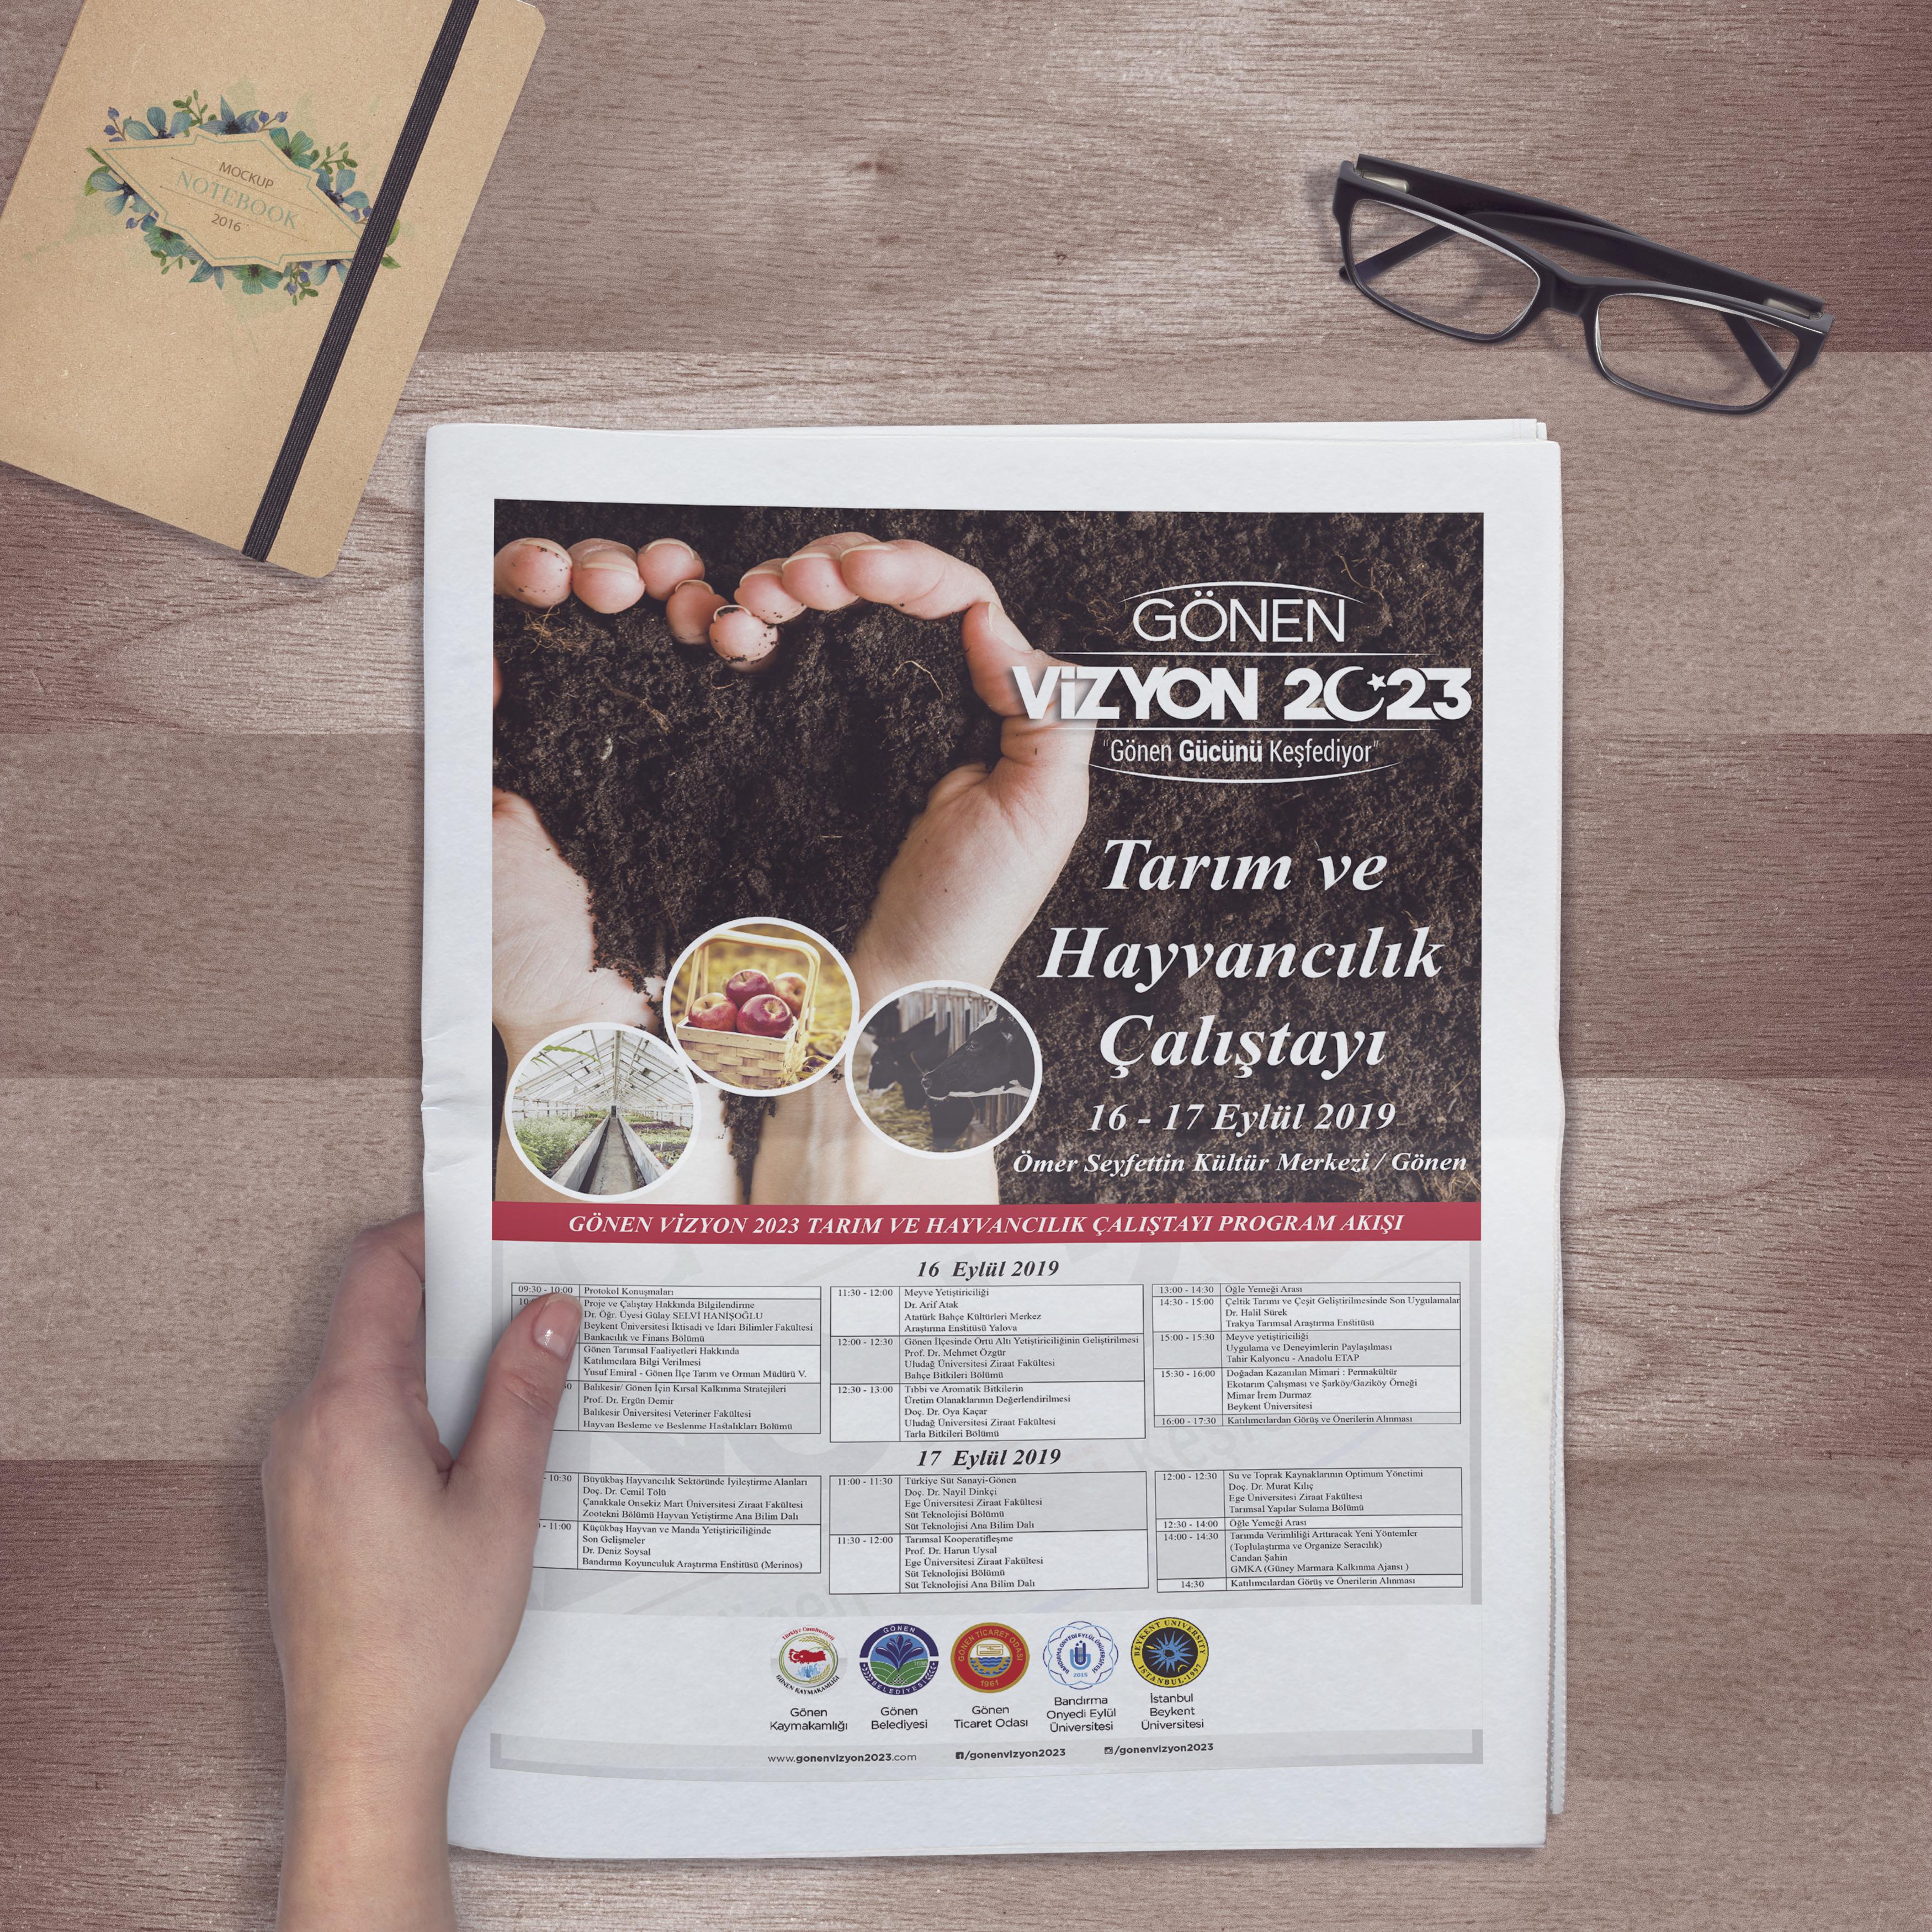 Gönen Vizyon 2023 Gazete